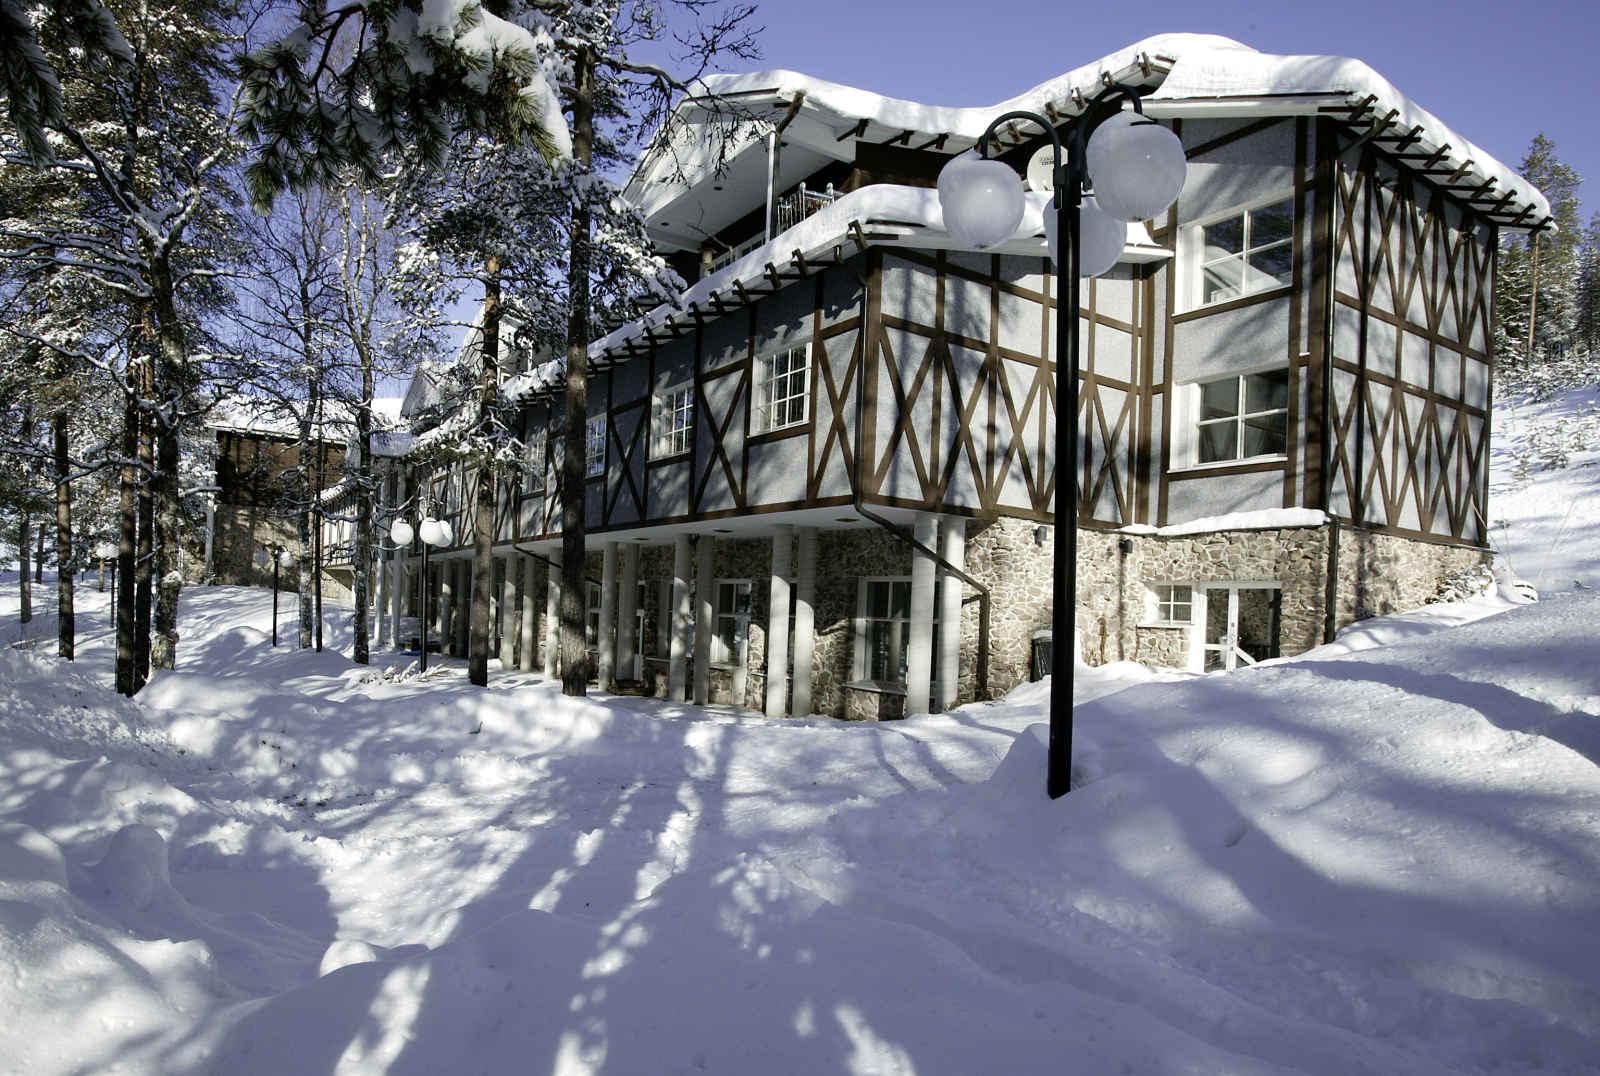 Finlande - Laponie - Rovaniemi - Hôtel Club Scanditours Pohtimo 3*